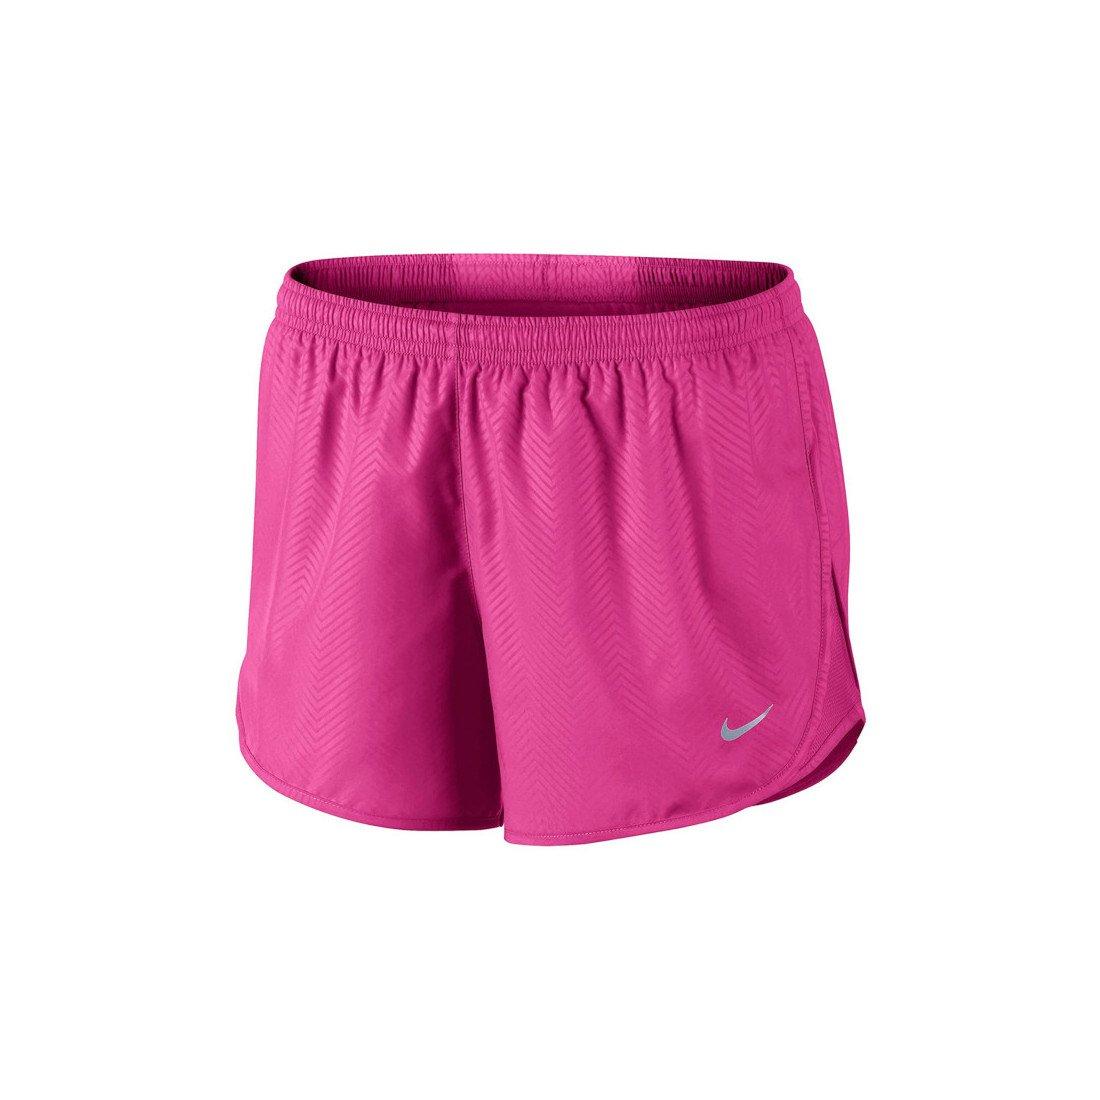 Nike Women's Modern Embossed Tempo Tennis Short (Pink)